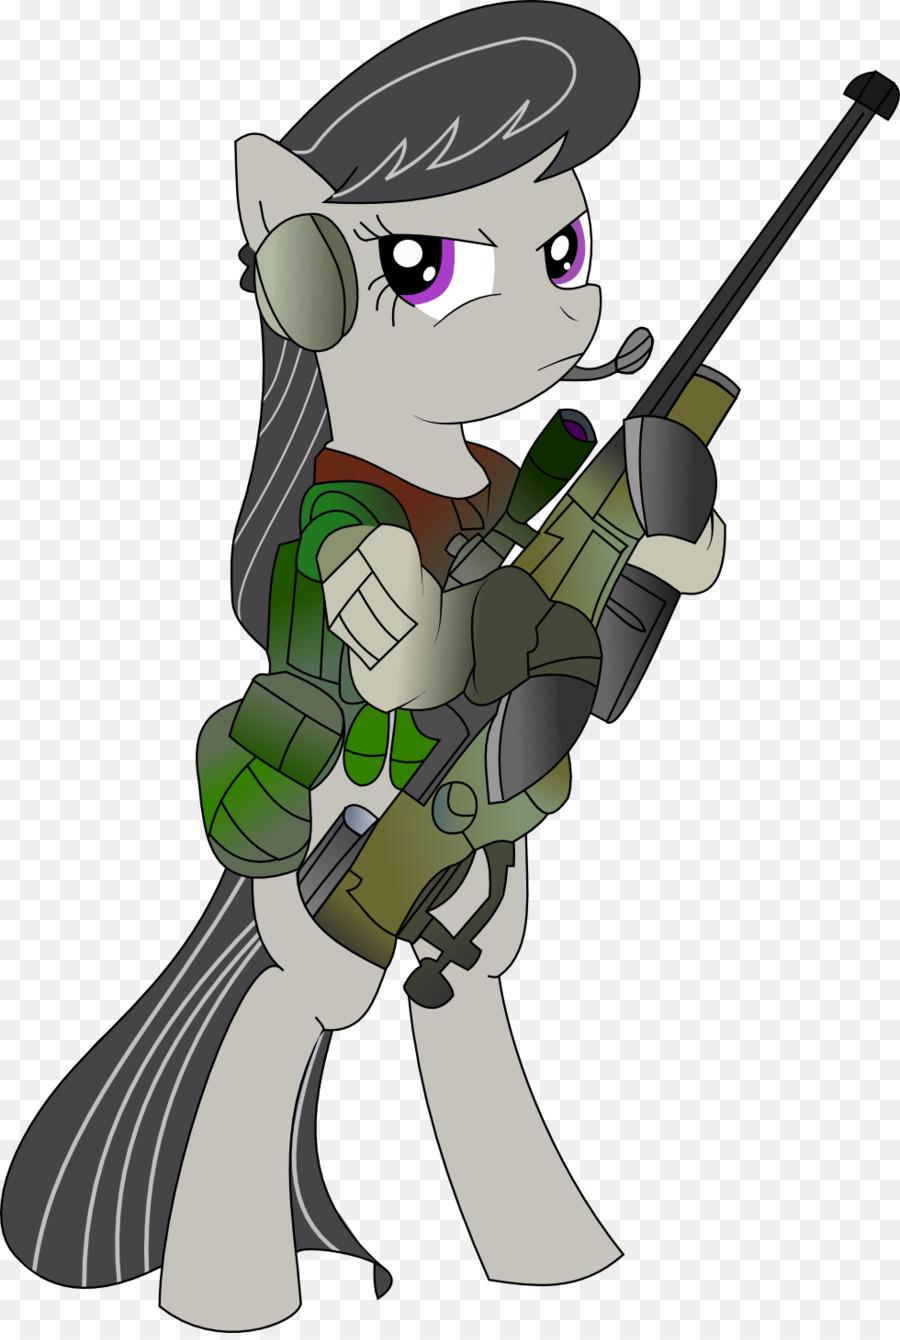 Pony Twilight Sparkle Applejack Rainbow -Pony Twilight Sparkle Applejack Rainbow Dash Pinkie Pie - sniper elite-7